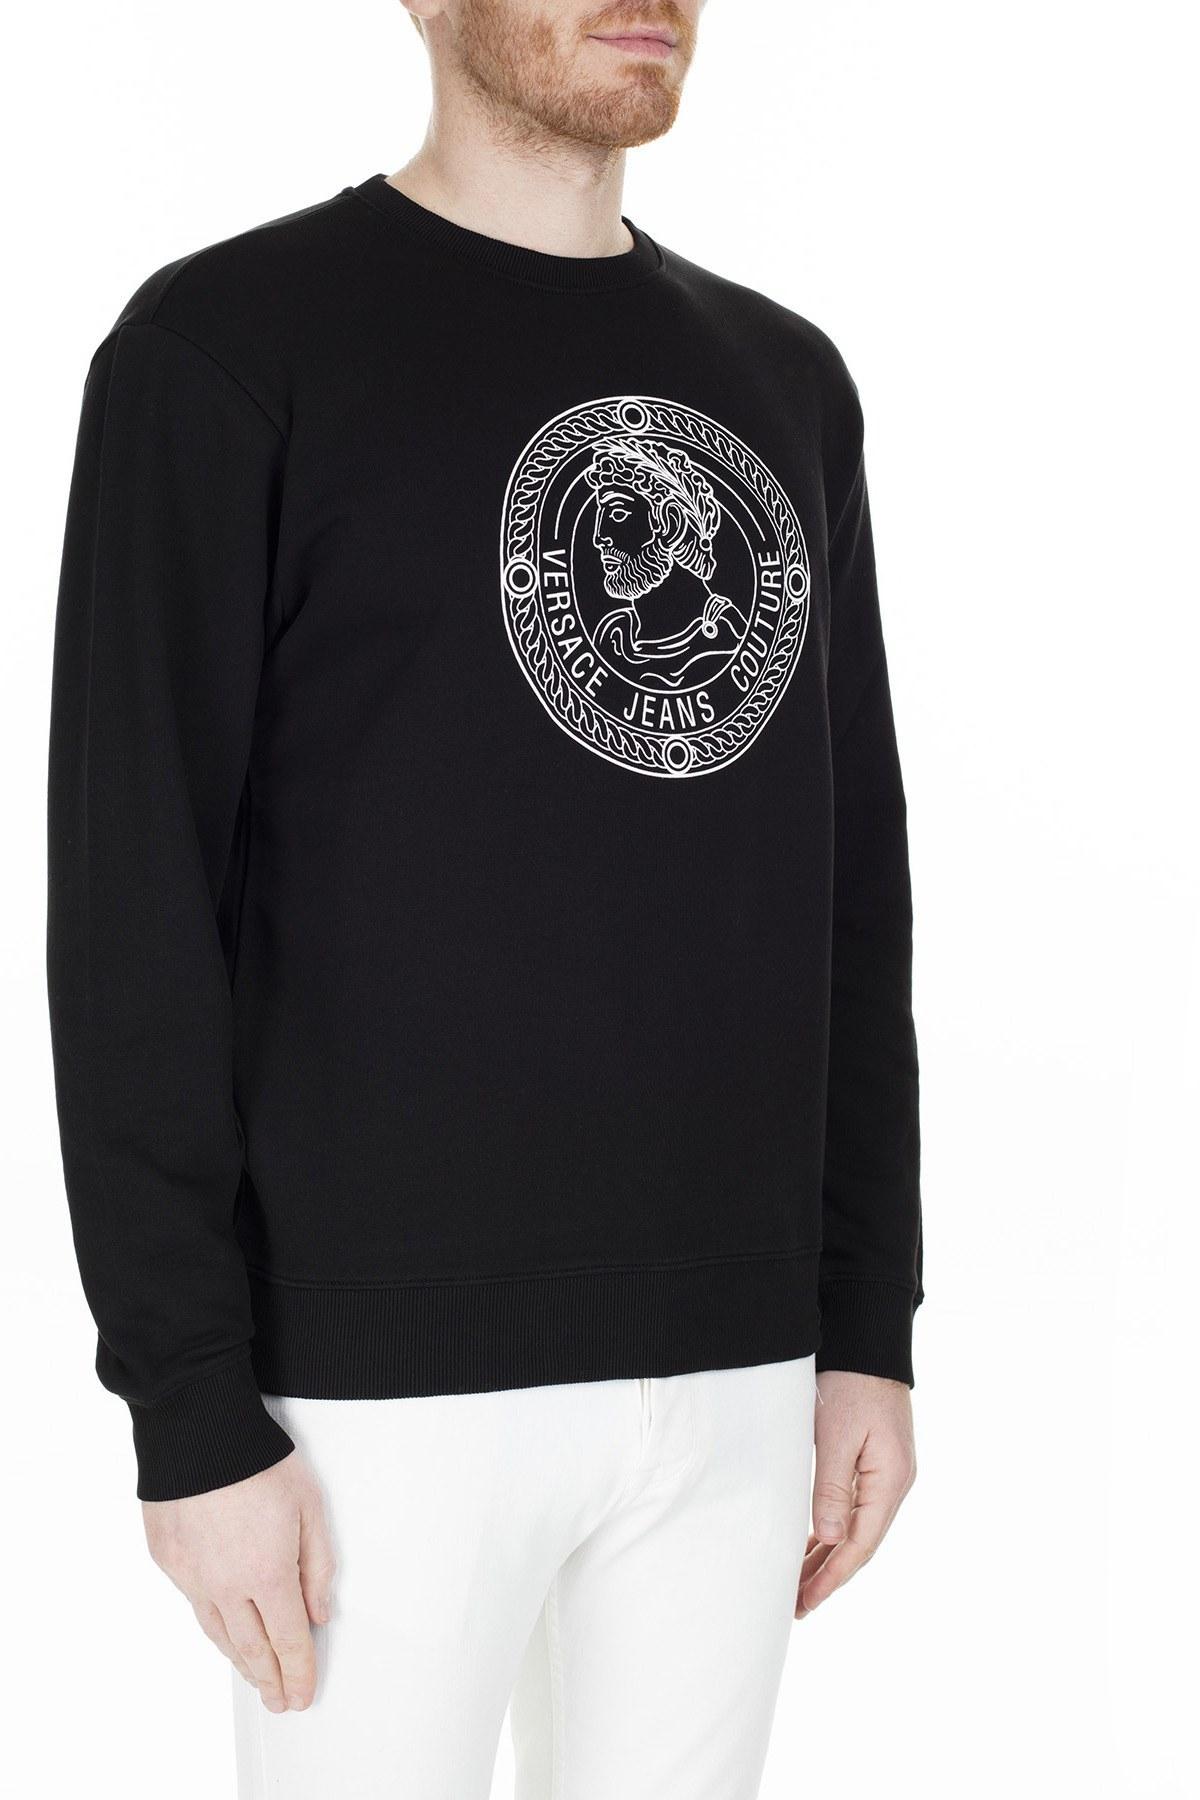 Versace Jeans Couture Erkek Sweat S B7GUA7F9 36604899 SİYAH